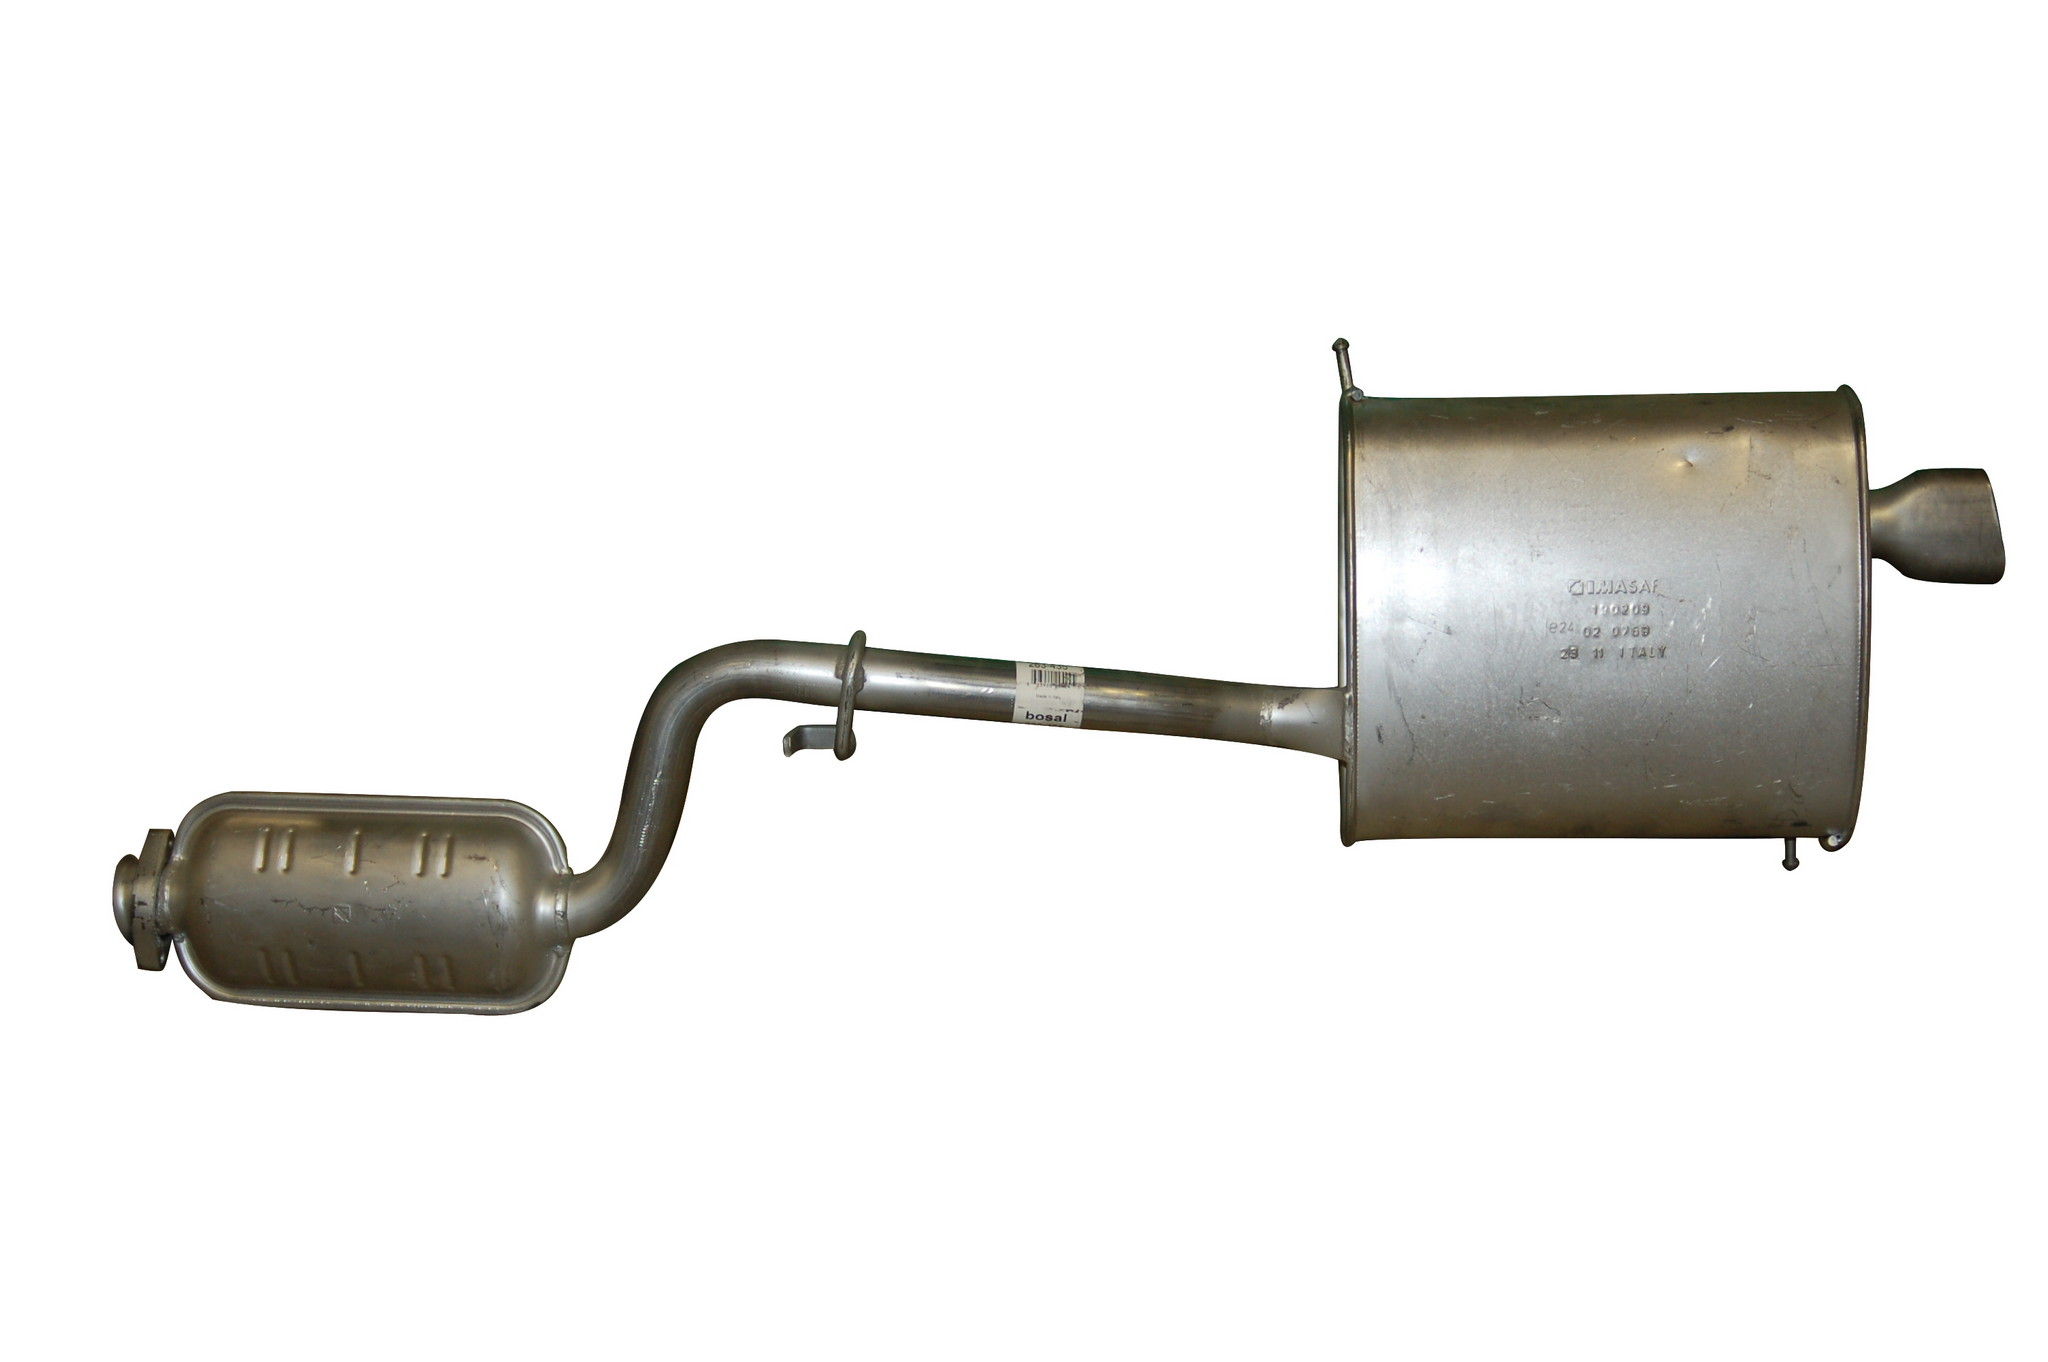 1997 Bmw Z3 Exhaust Muffler Assembly Autopartskart Com